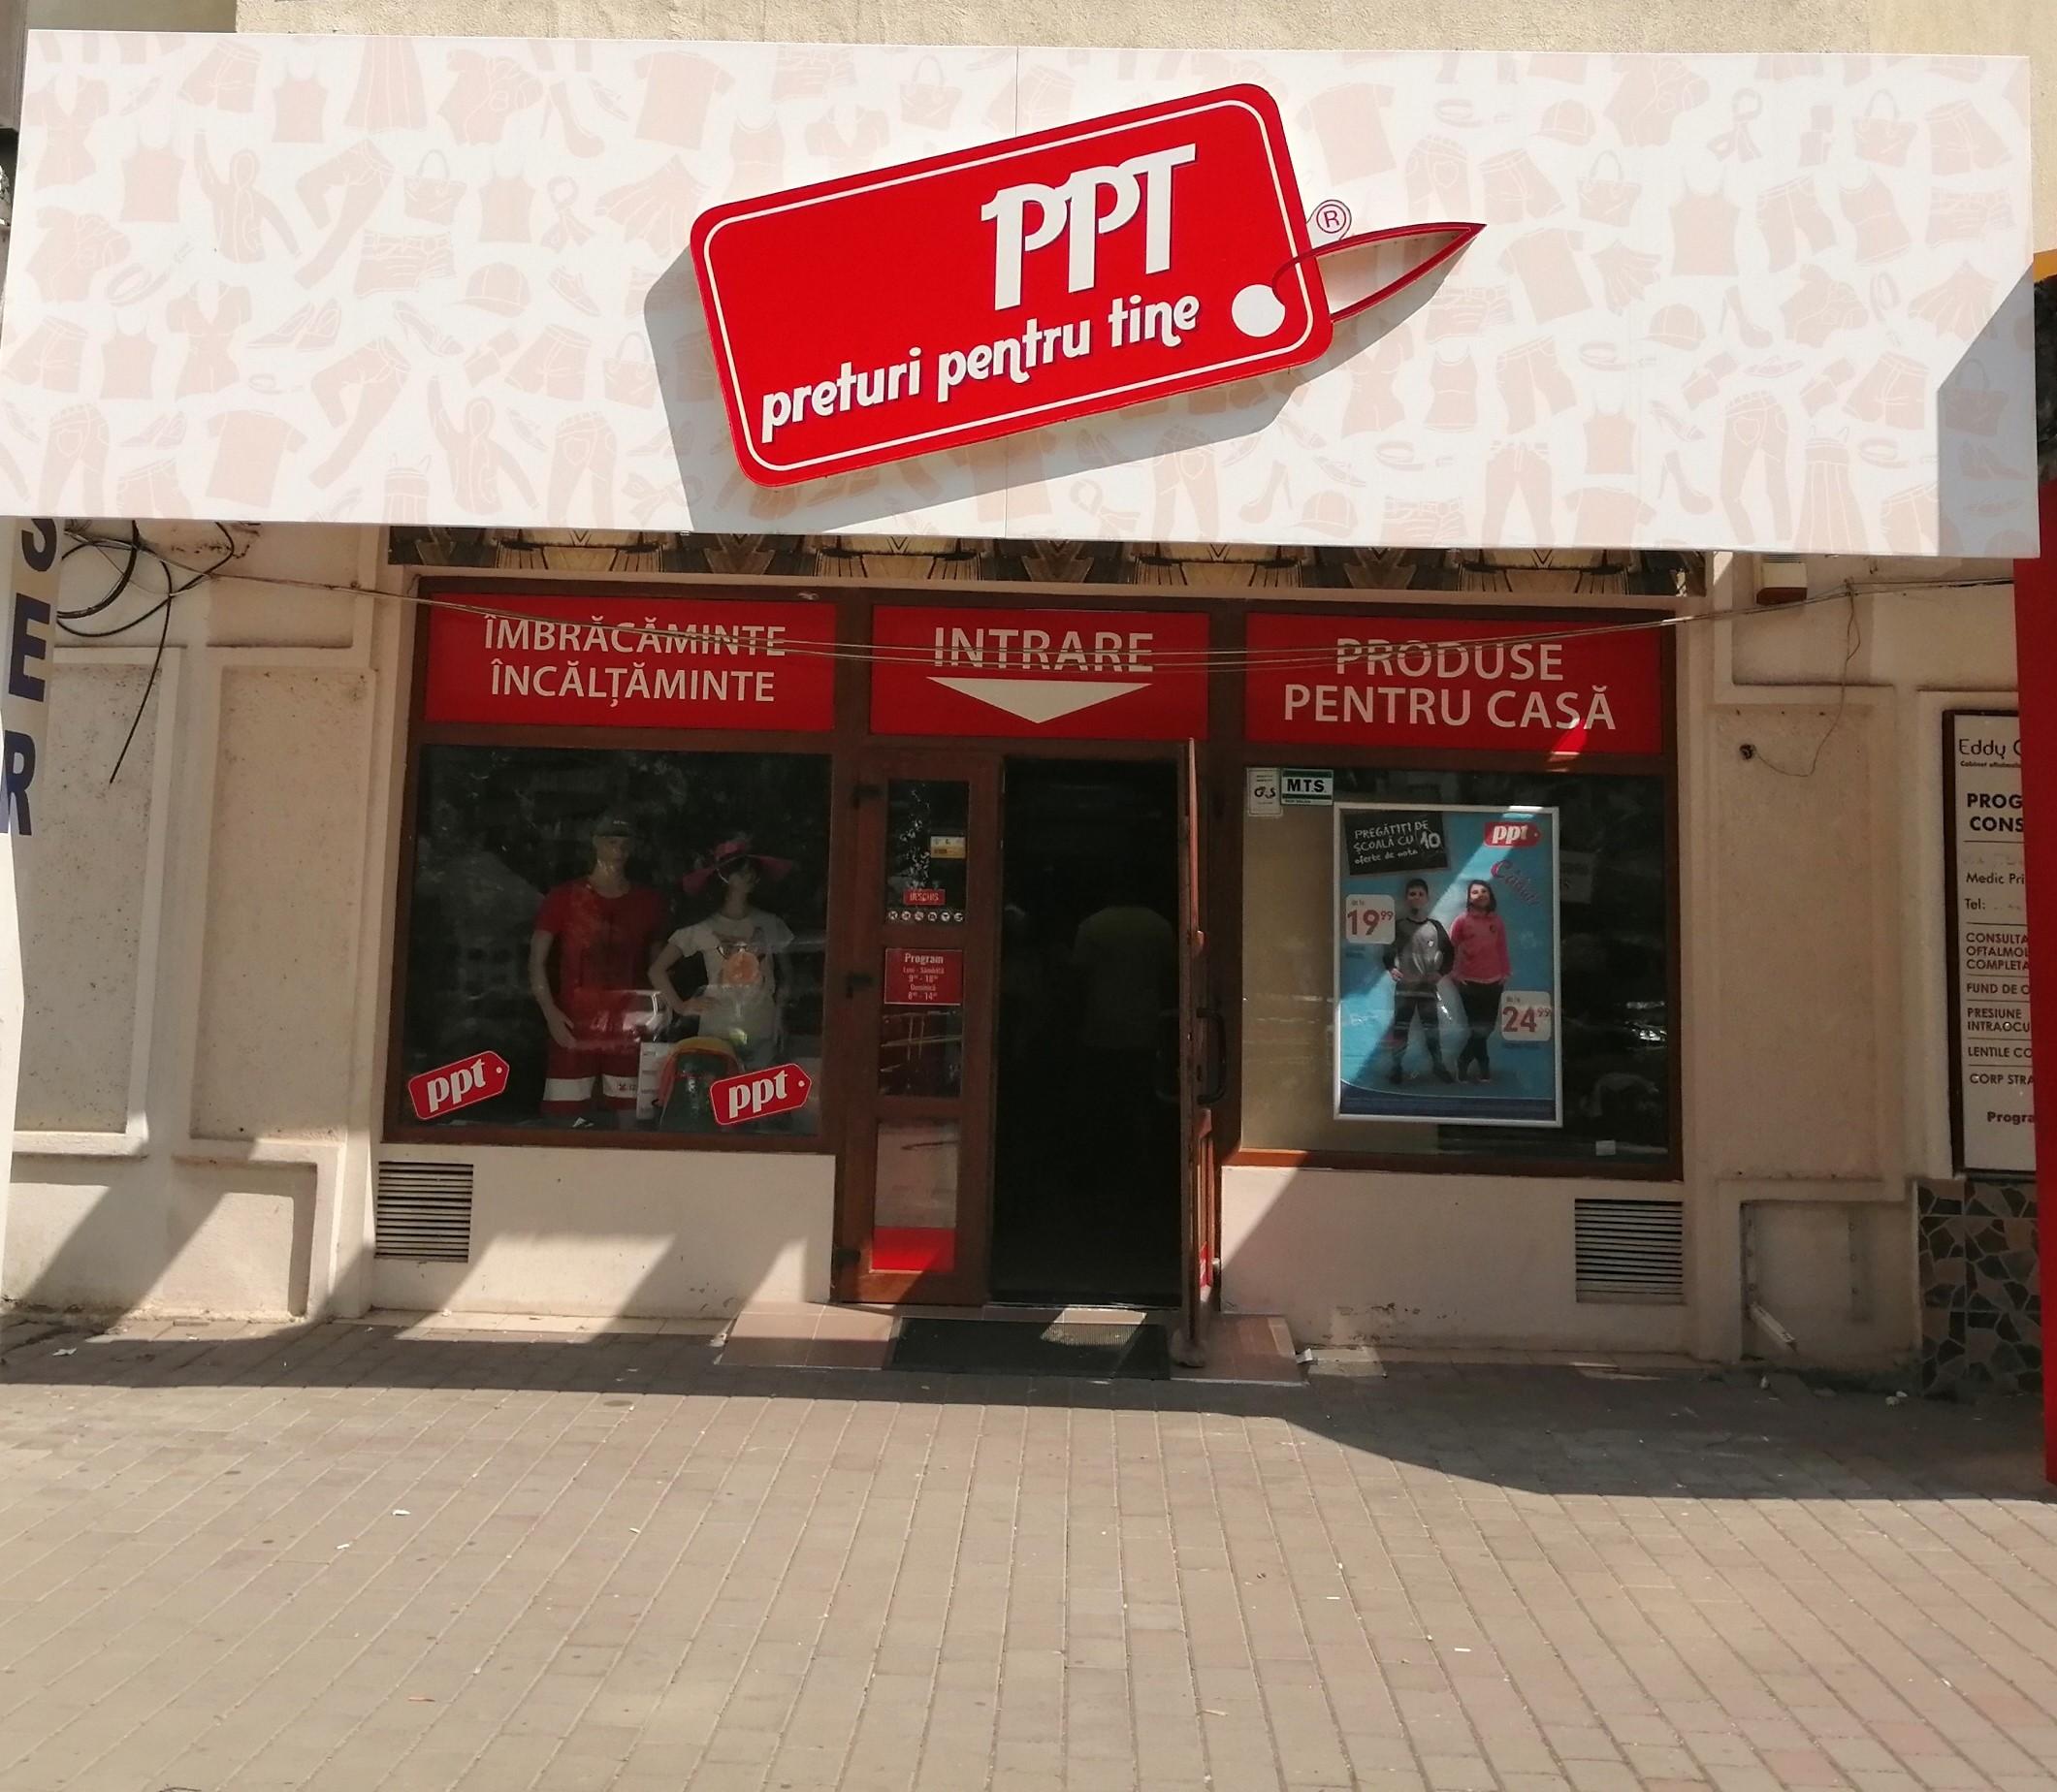 PPT Iași - Alexandru cel Bun